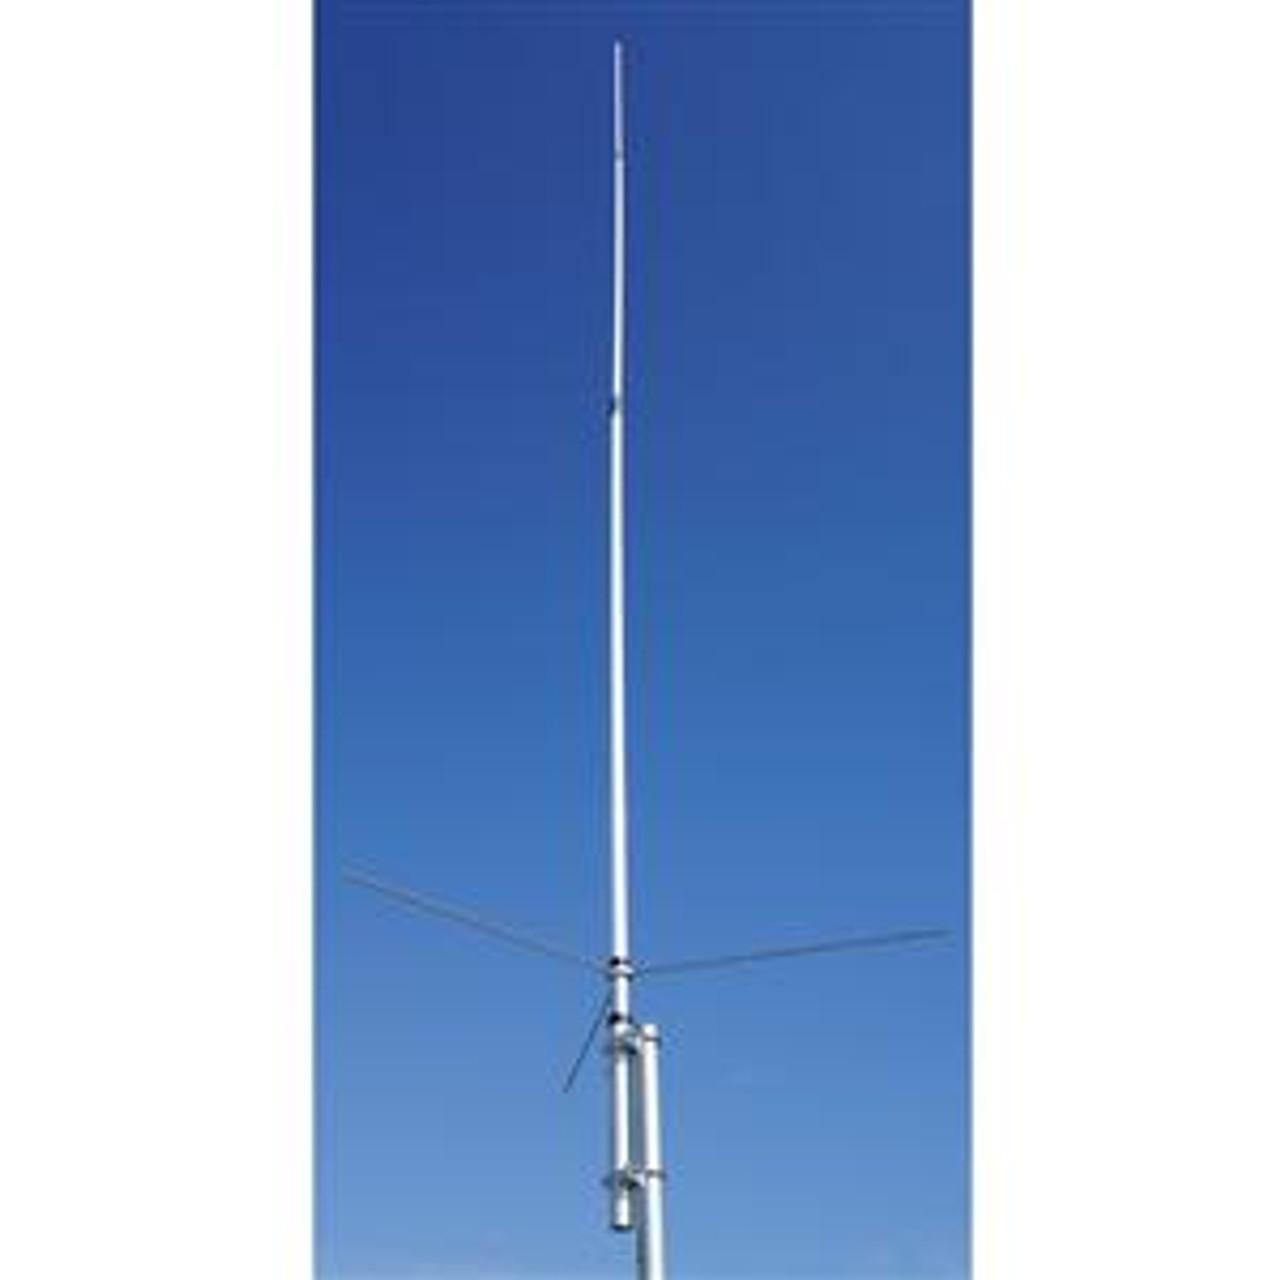 Tram-Browning BR-1481 Dual Band VHF/UHF Base Antenna